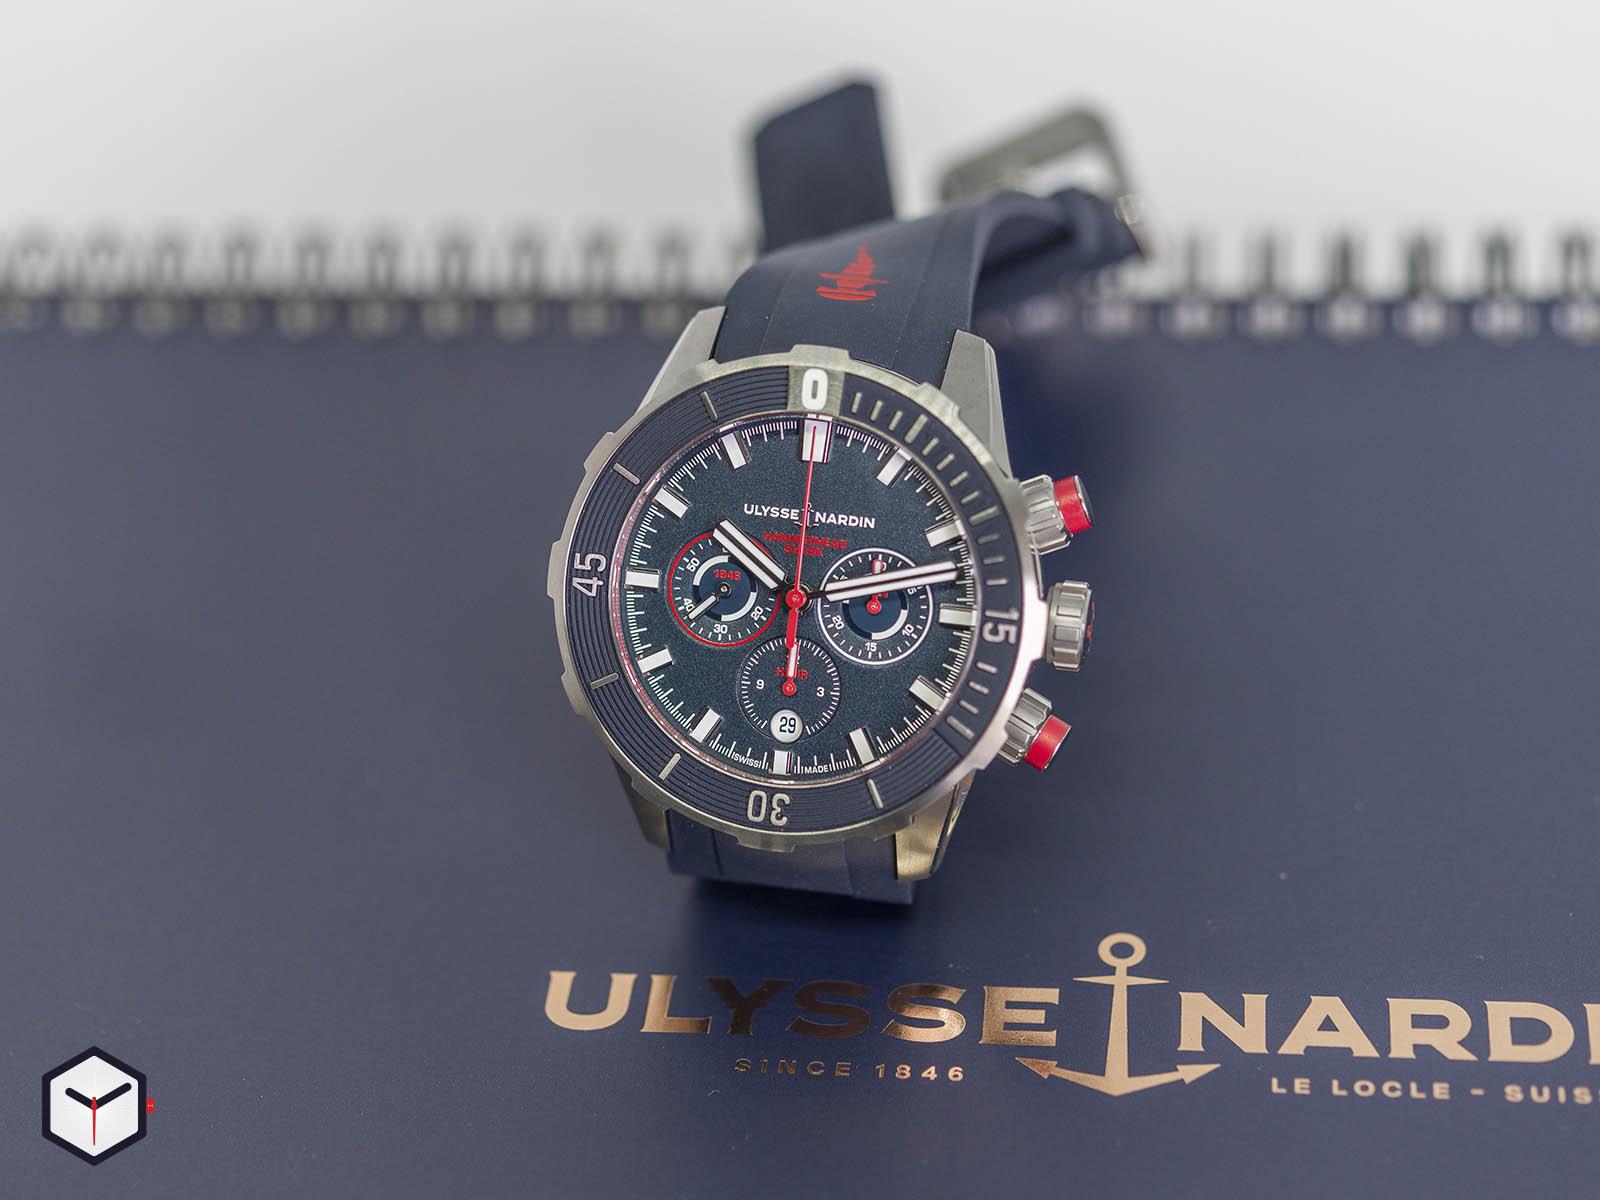 1503-170le-3-93-hammer-ulysse-nardin-diver-chronograph-44mm-hammerhead-shark-2.jpg